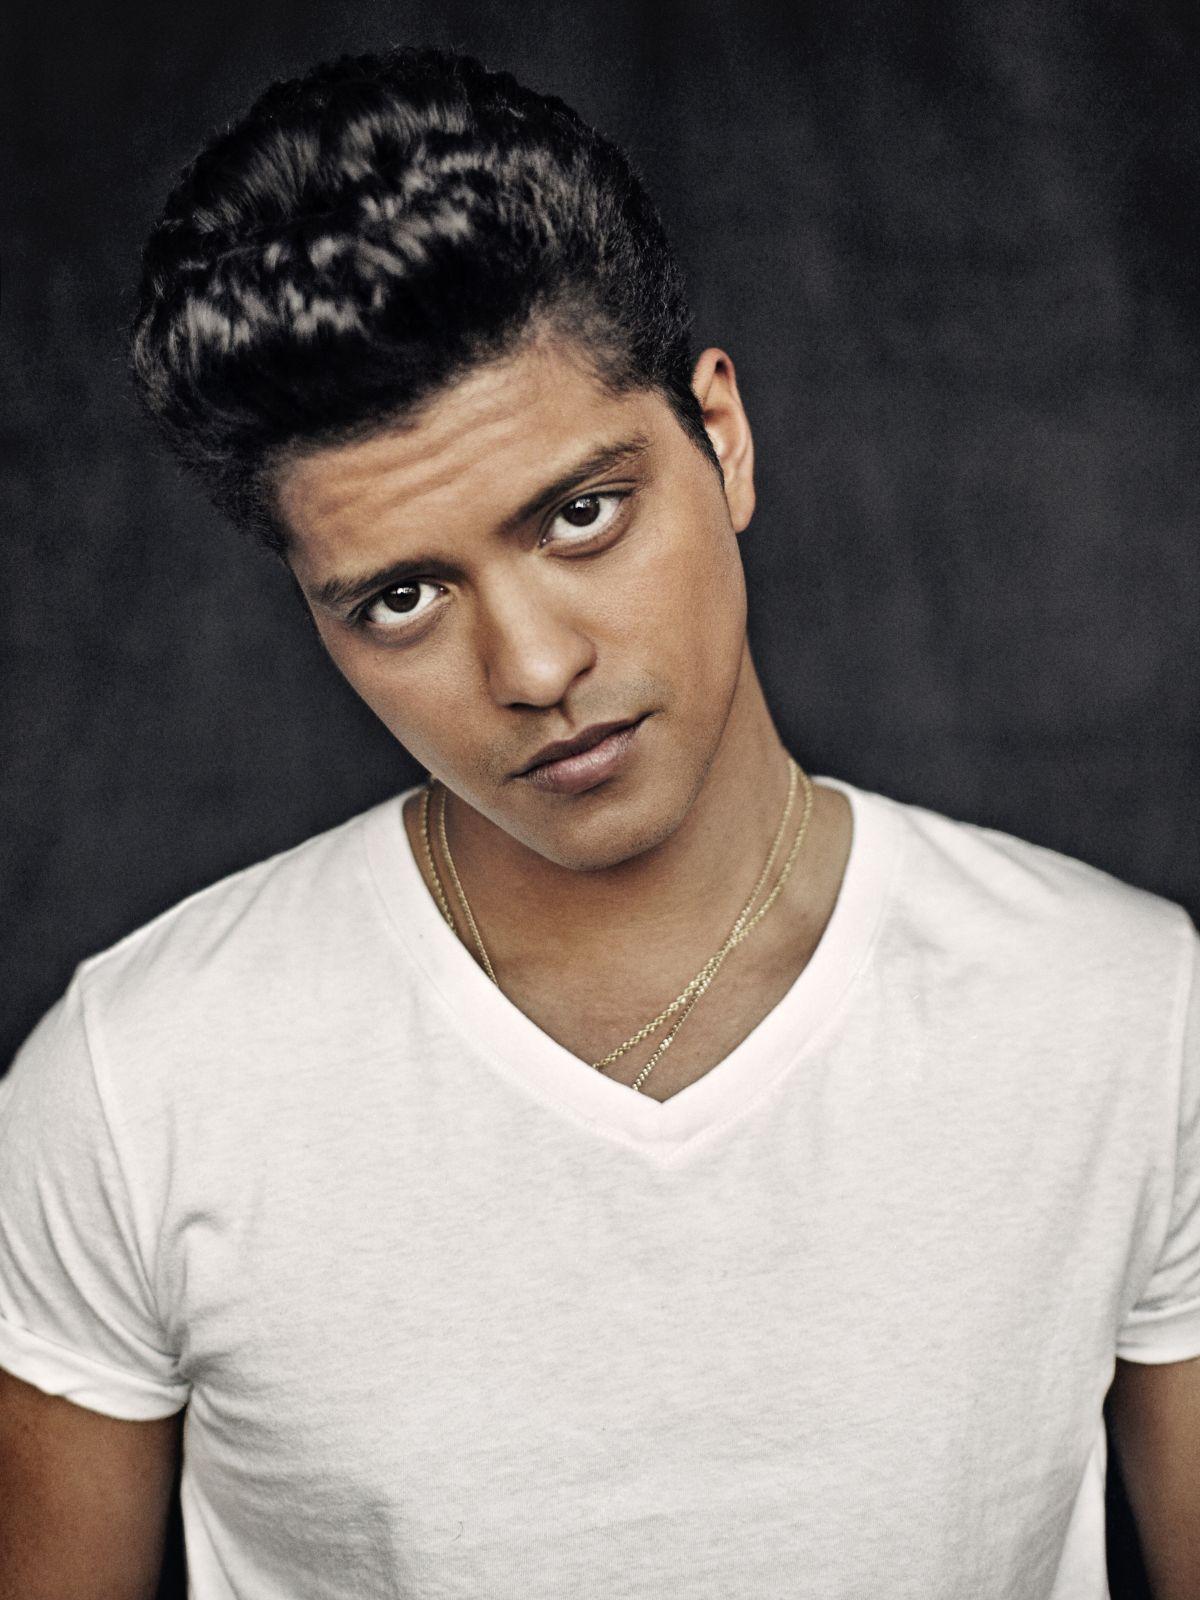 Bruno Mars Iphone Background